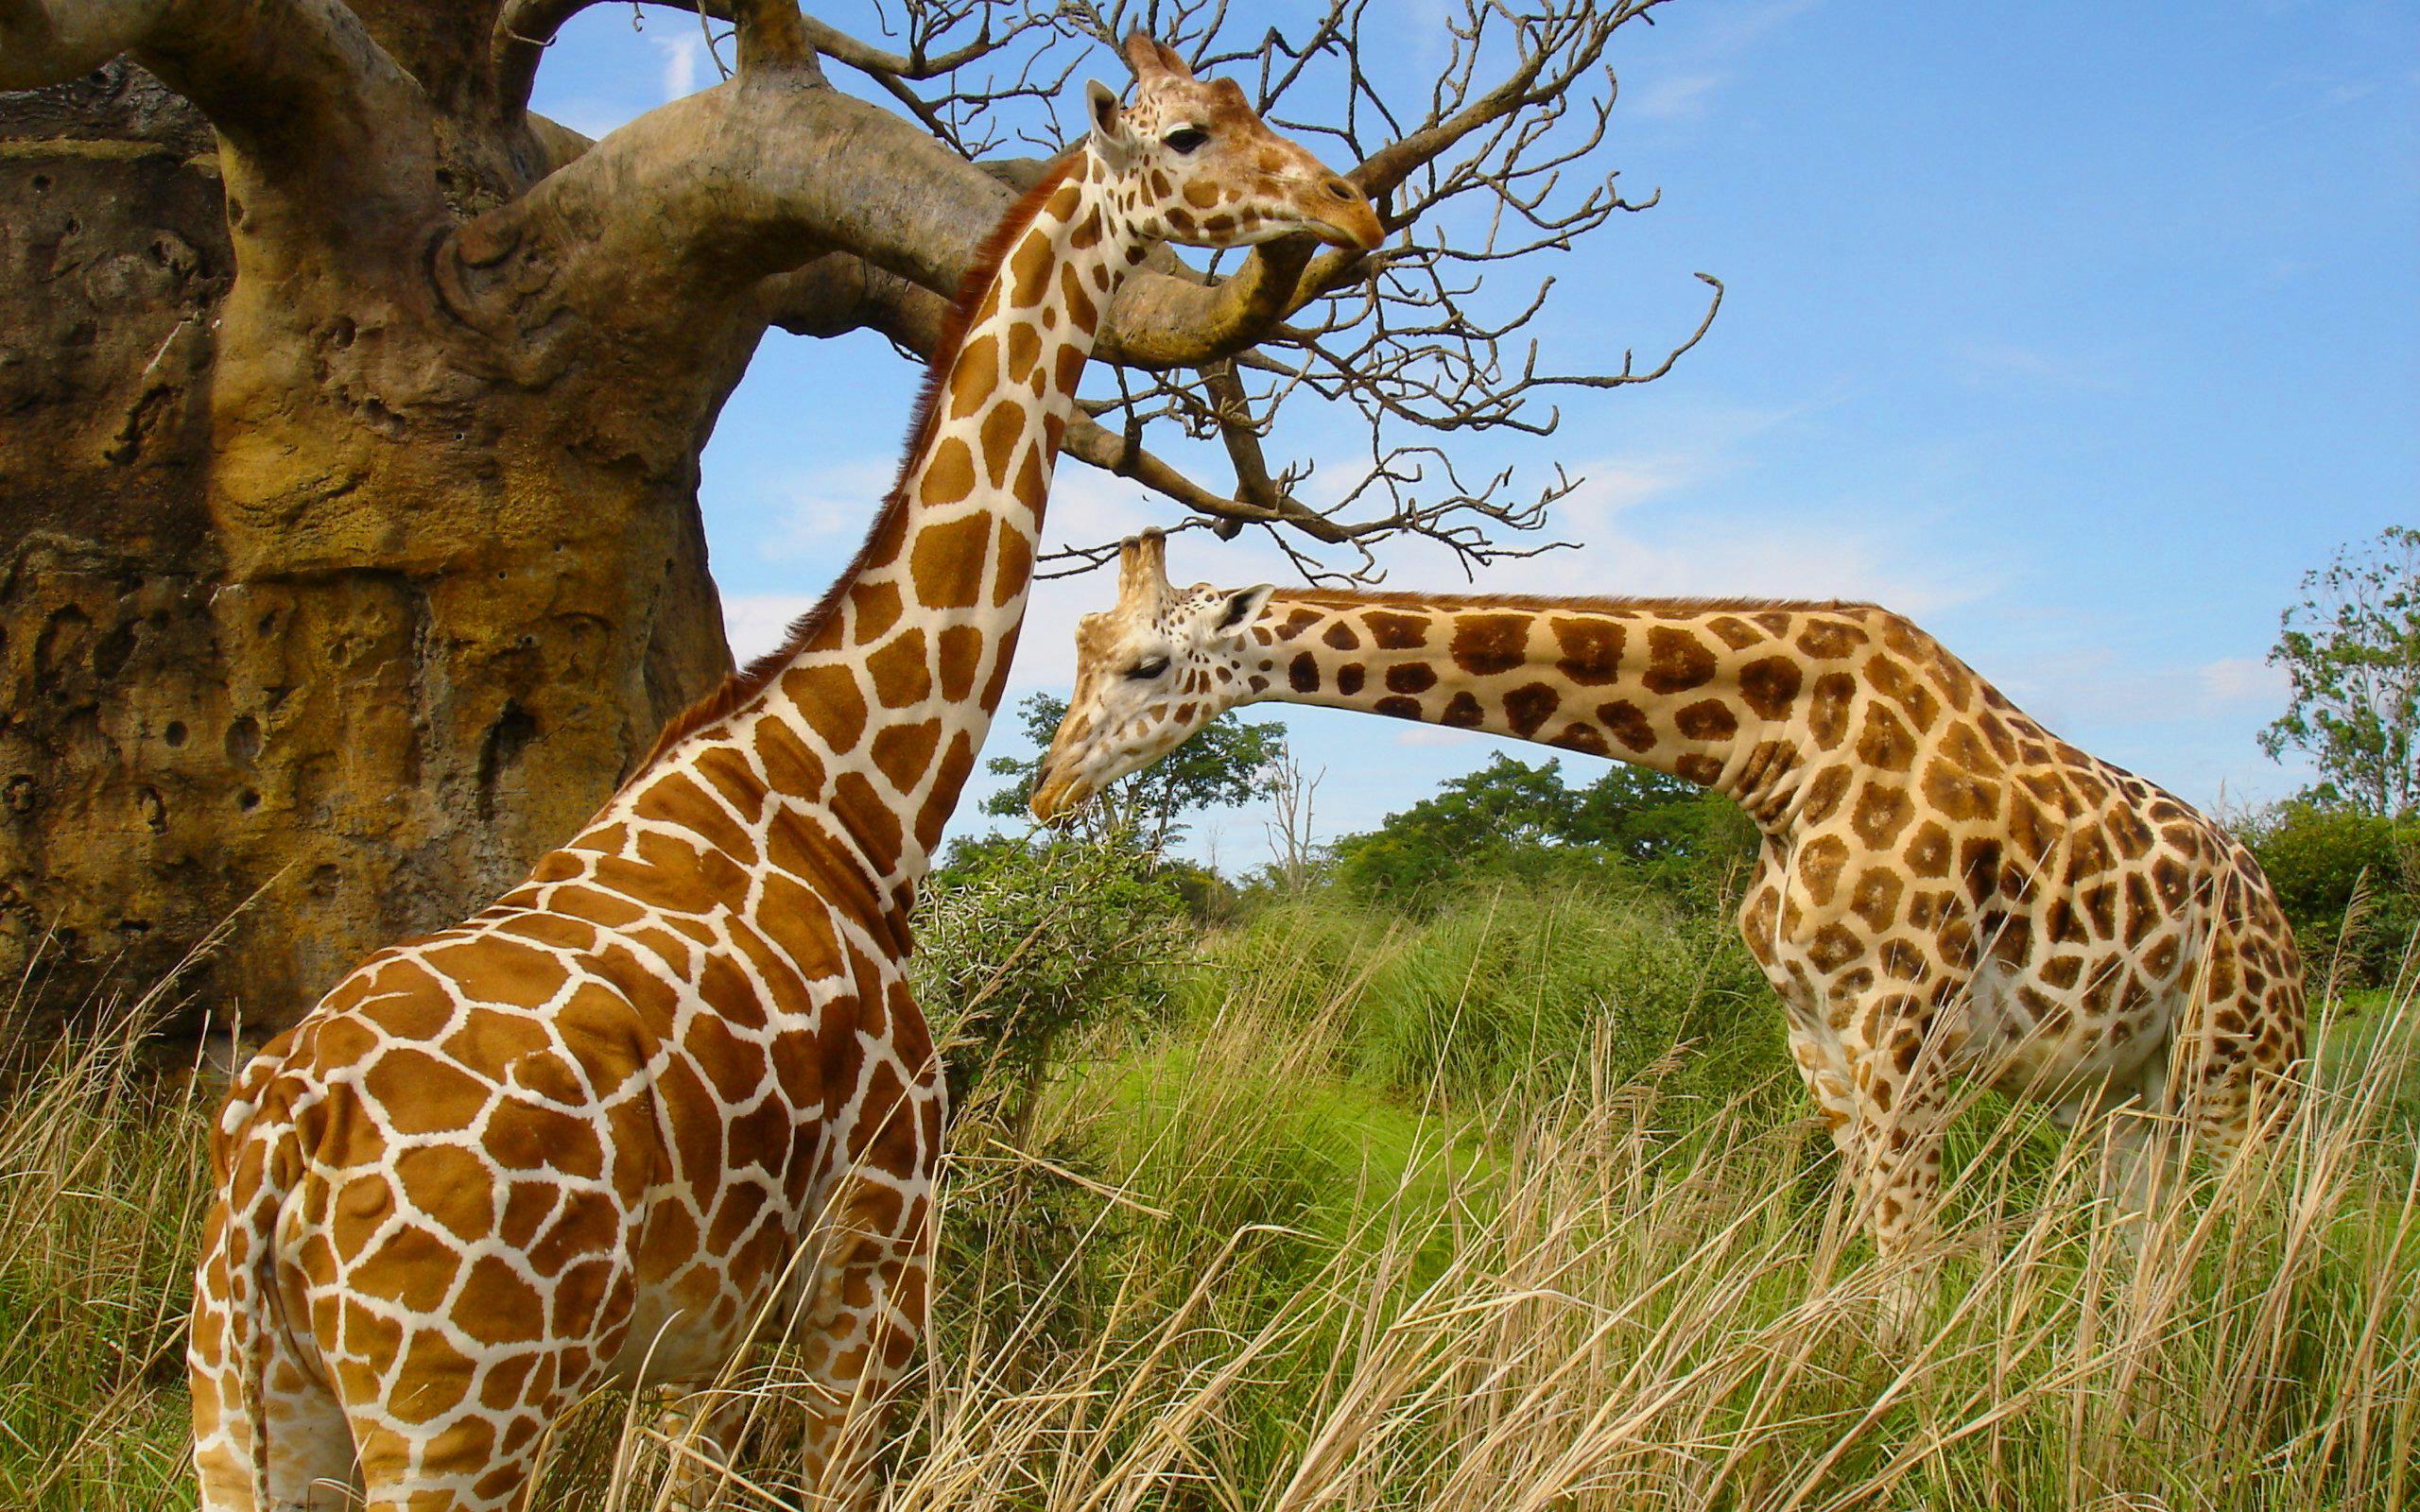 giraffe image download